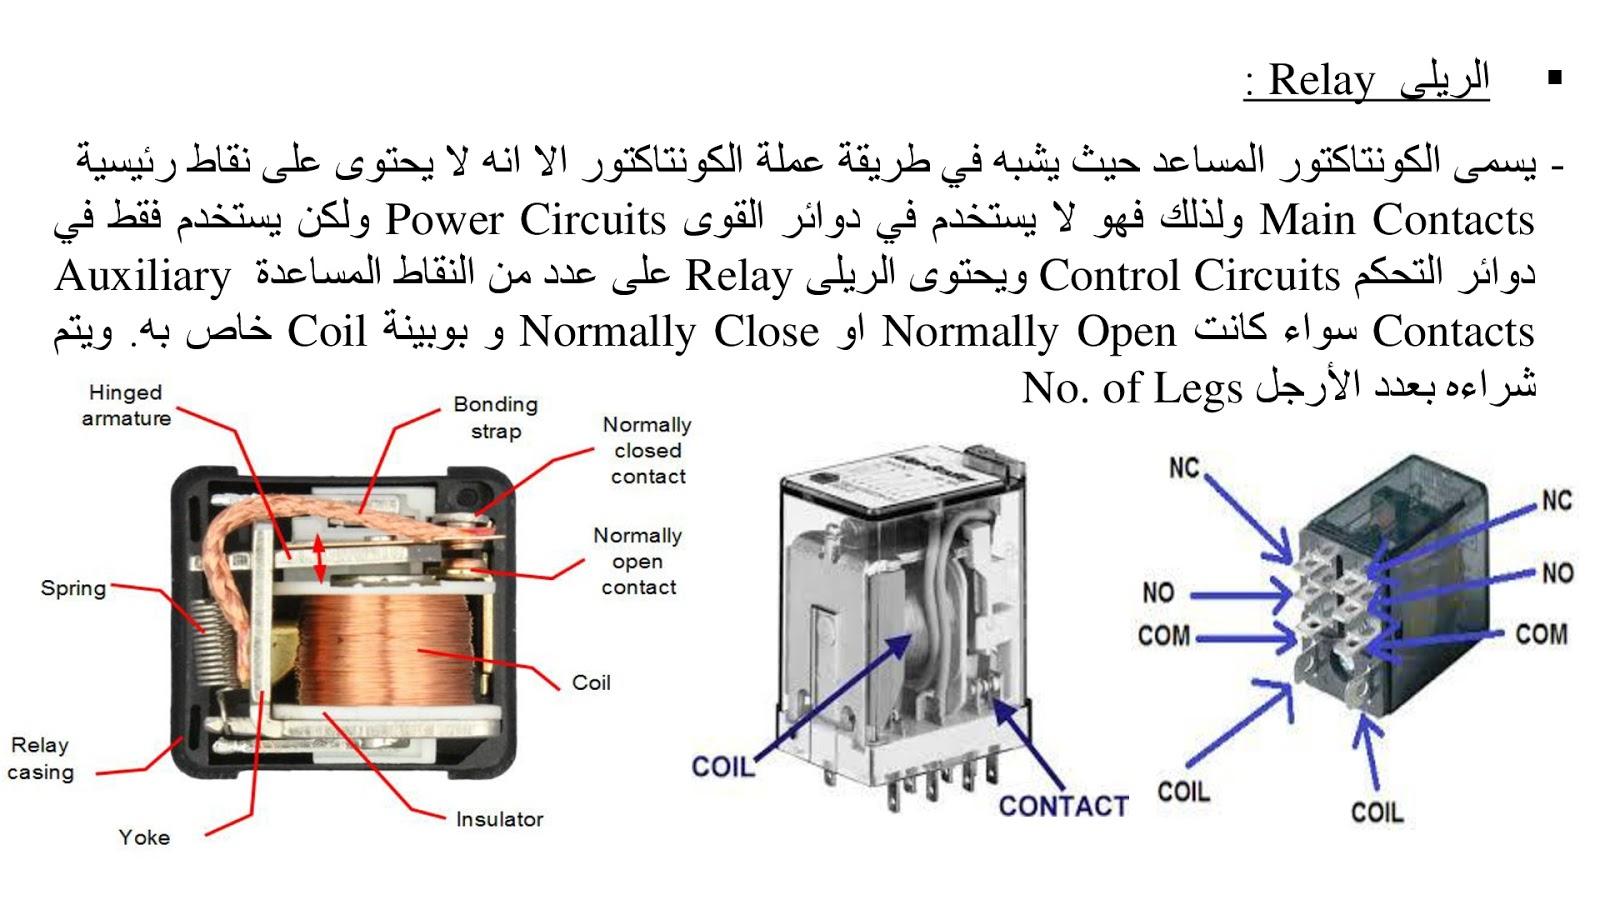 كورس كلاسيك كنترول فرقة اولي باور هندسة الشروق كاملا Course Classic Control 1st Power Engineering Elshrouk academy full